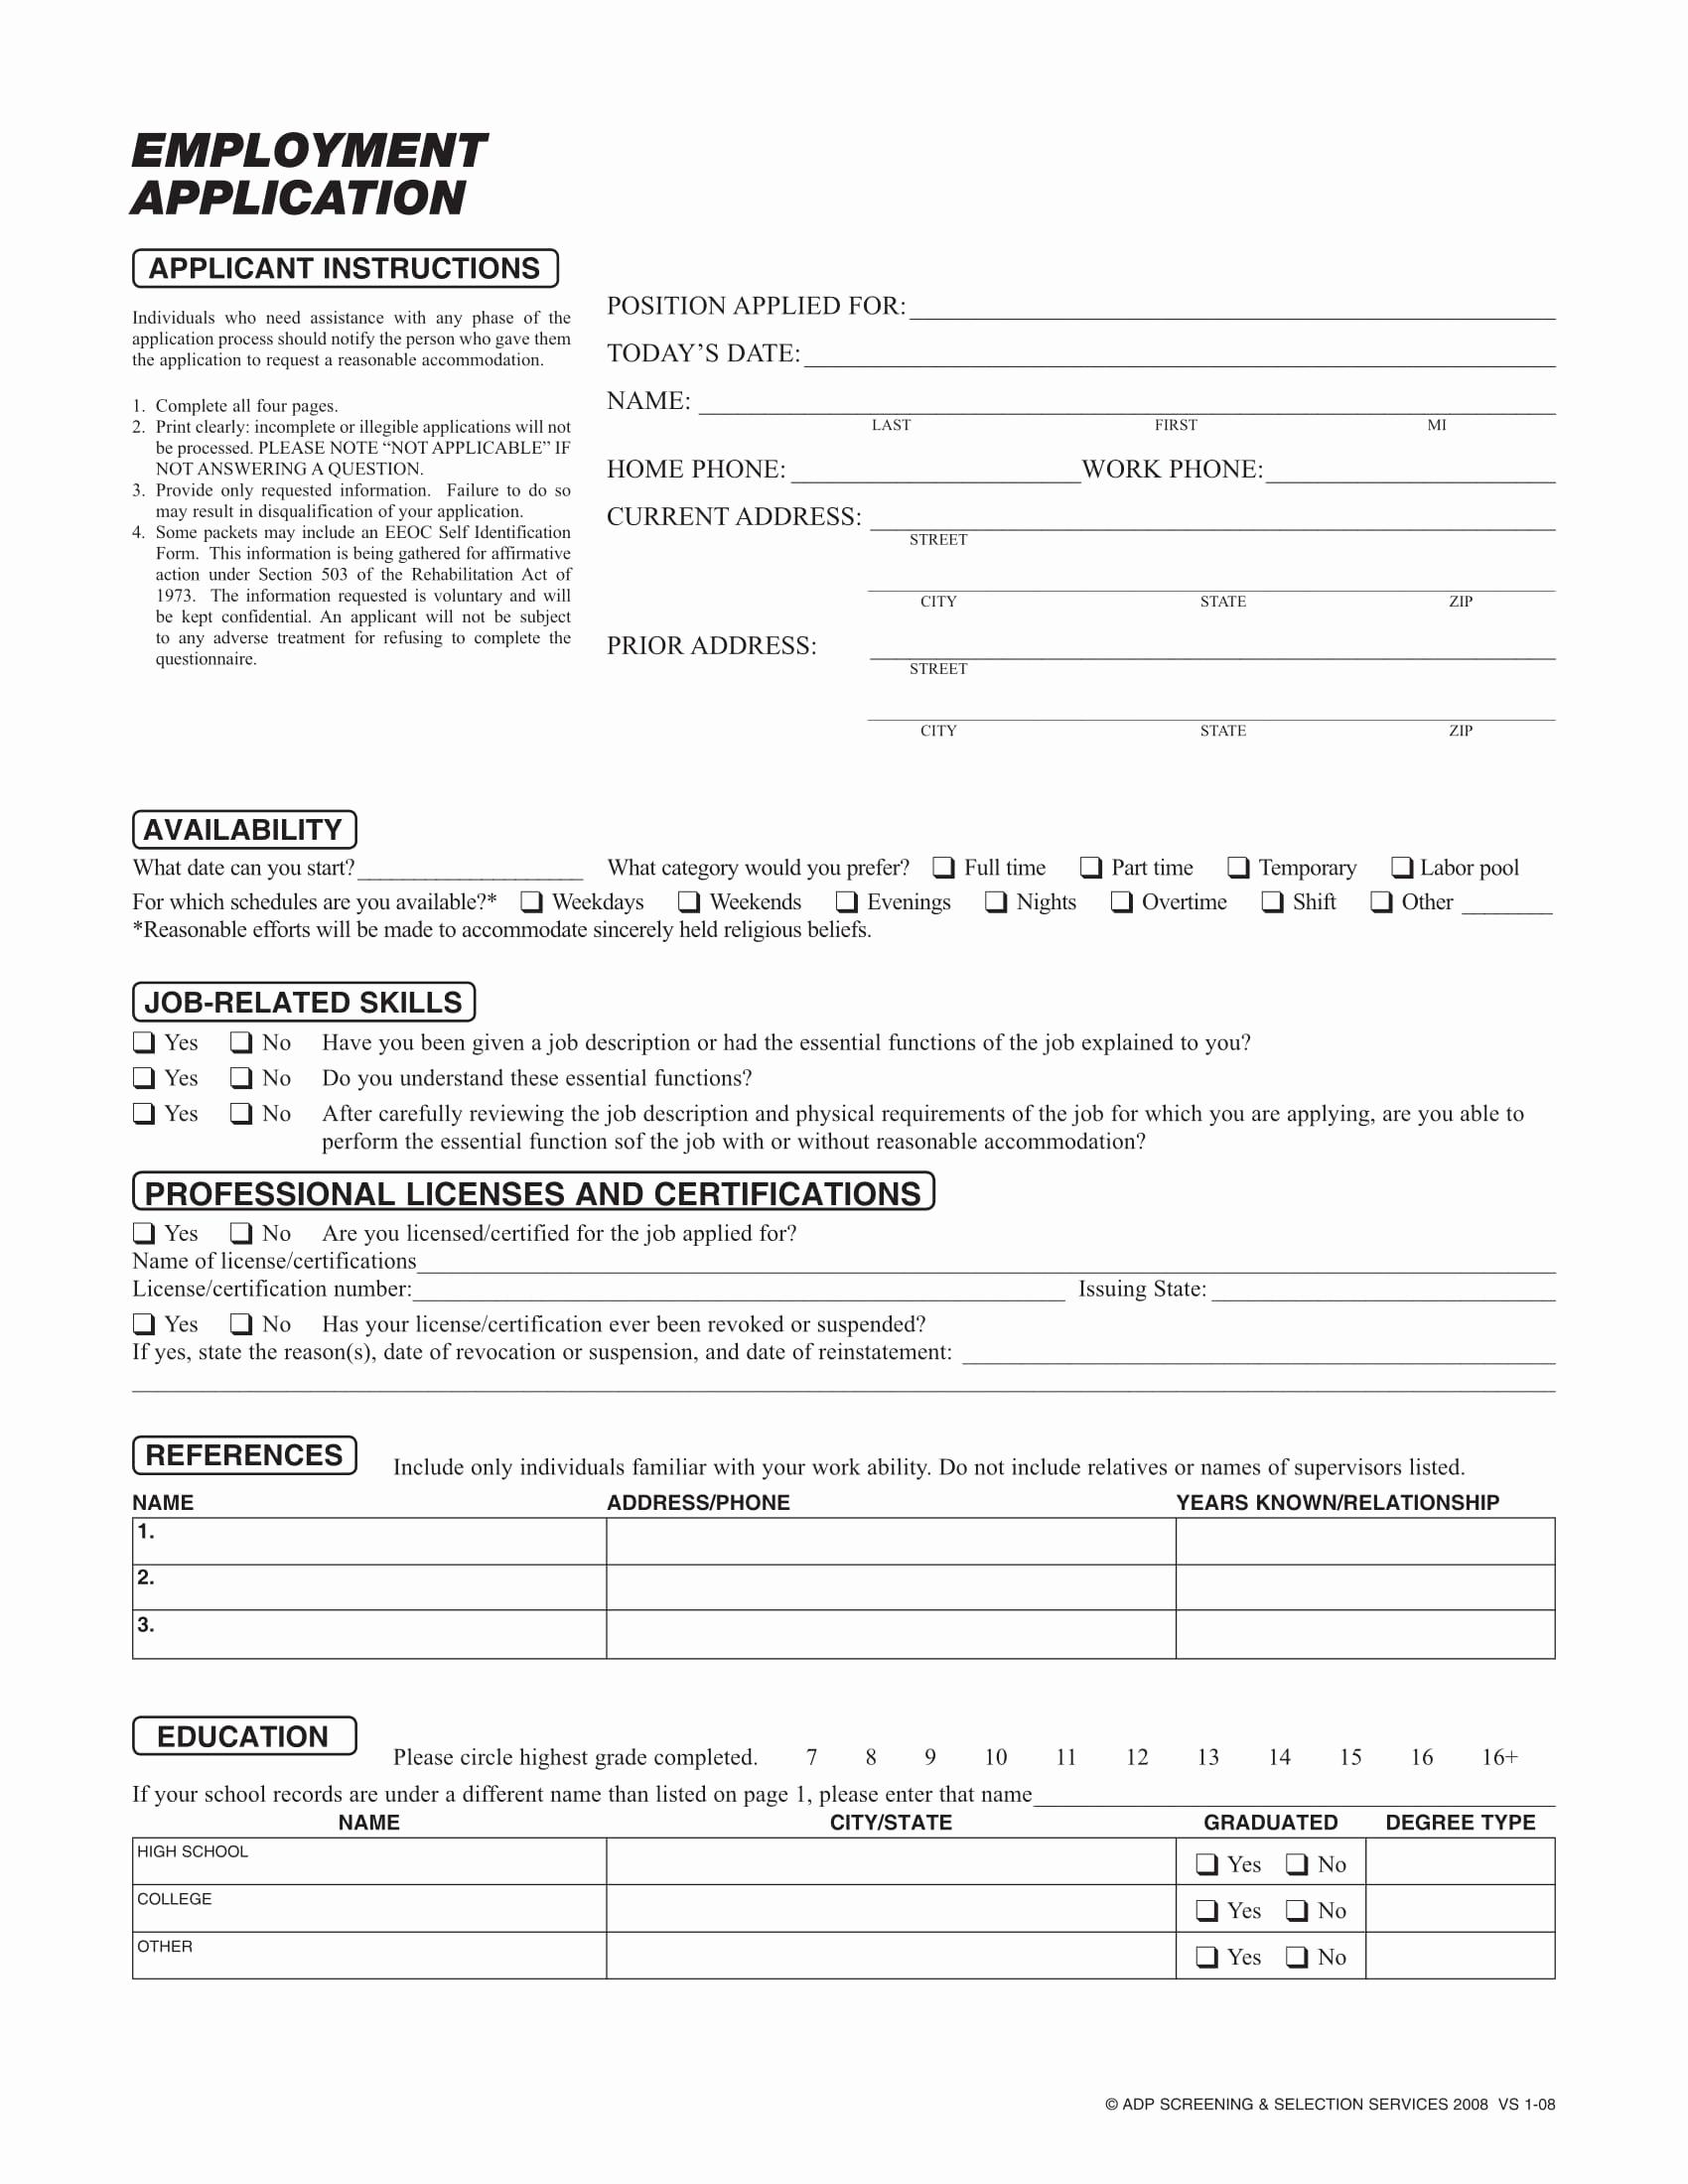 Standard Job Application format Lovely 20 Application form Samples for Job events Businesses